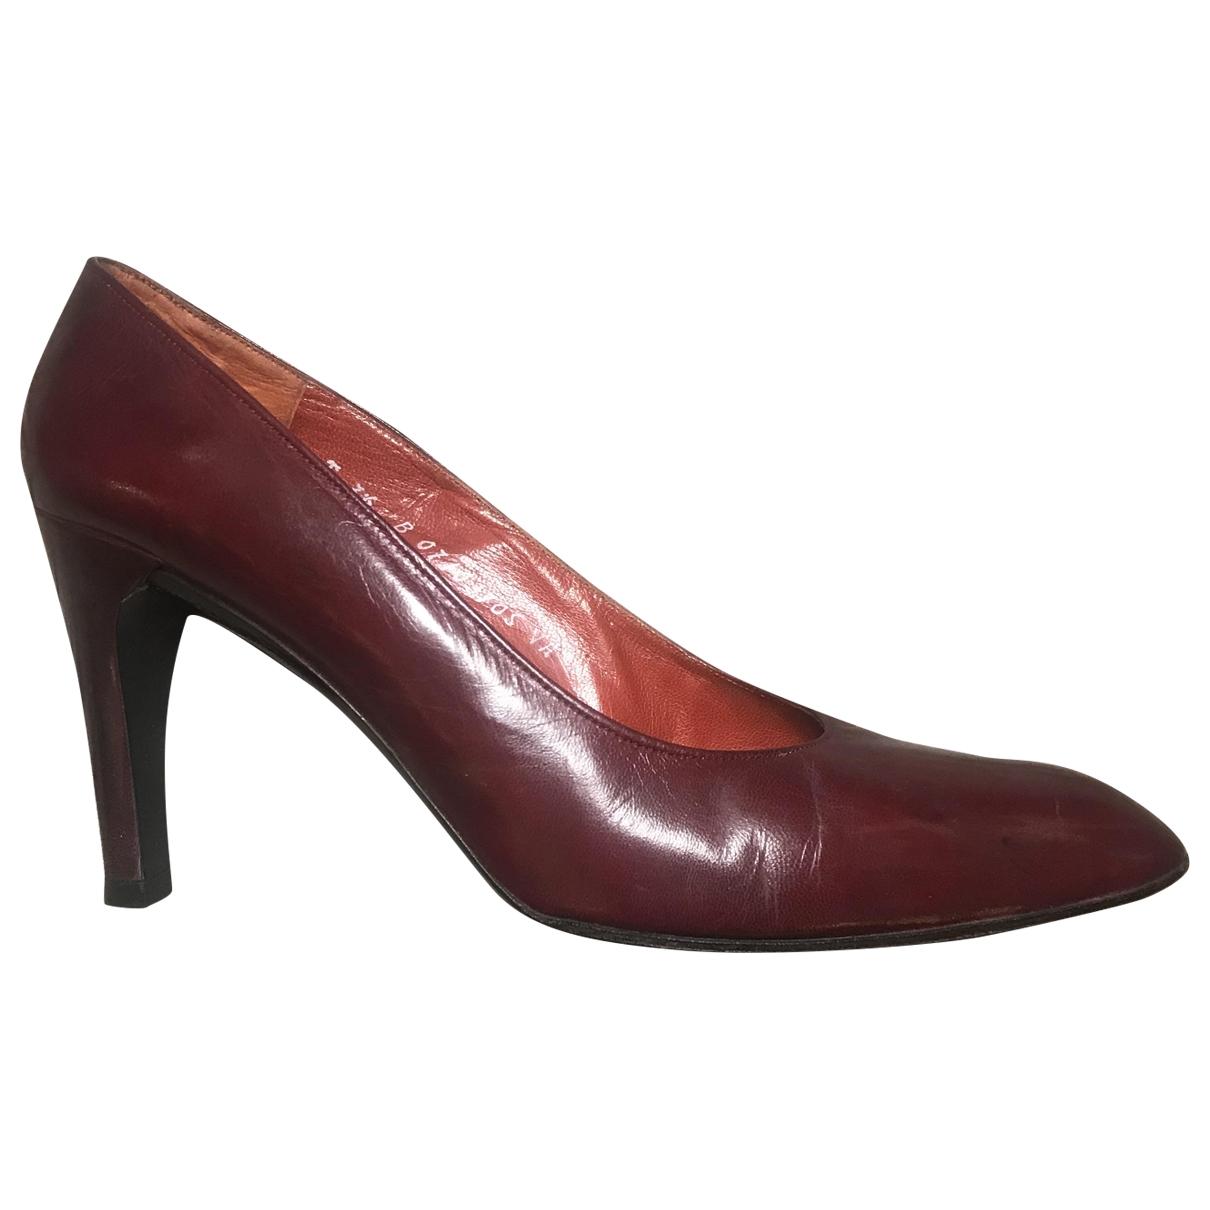 Dior \N Burgundy Leather Heels for Women 7.5 US